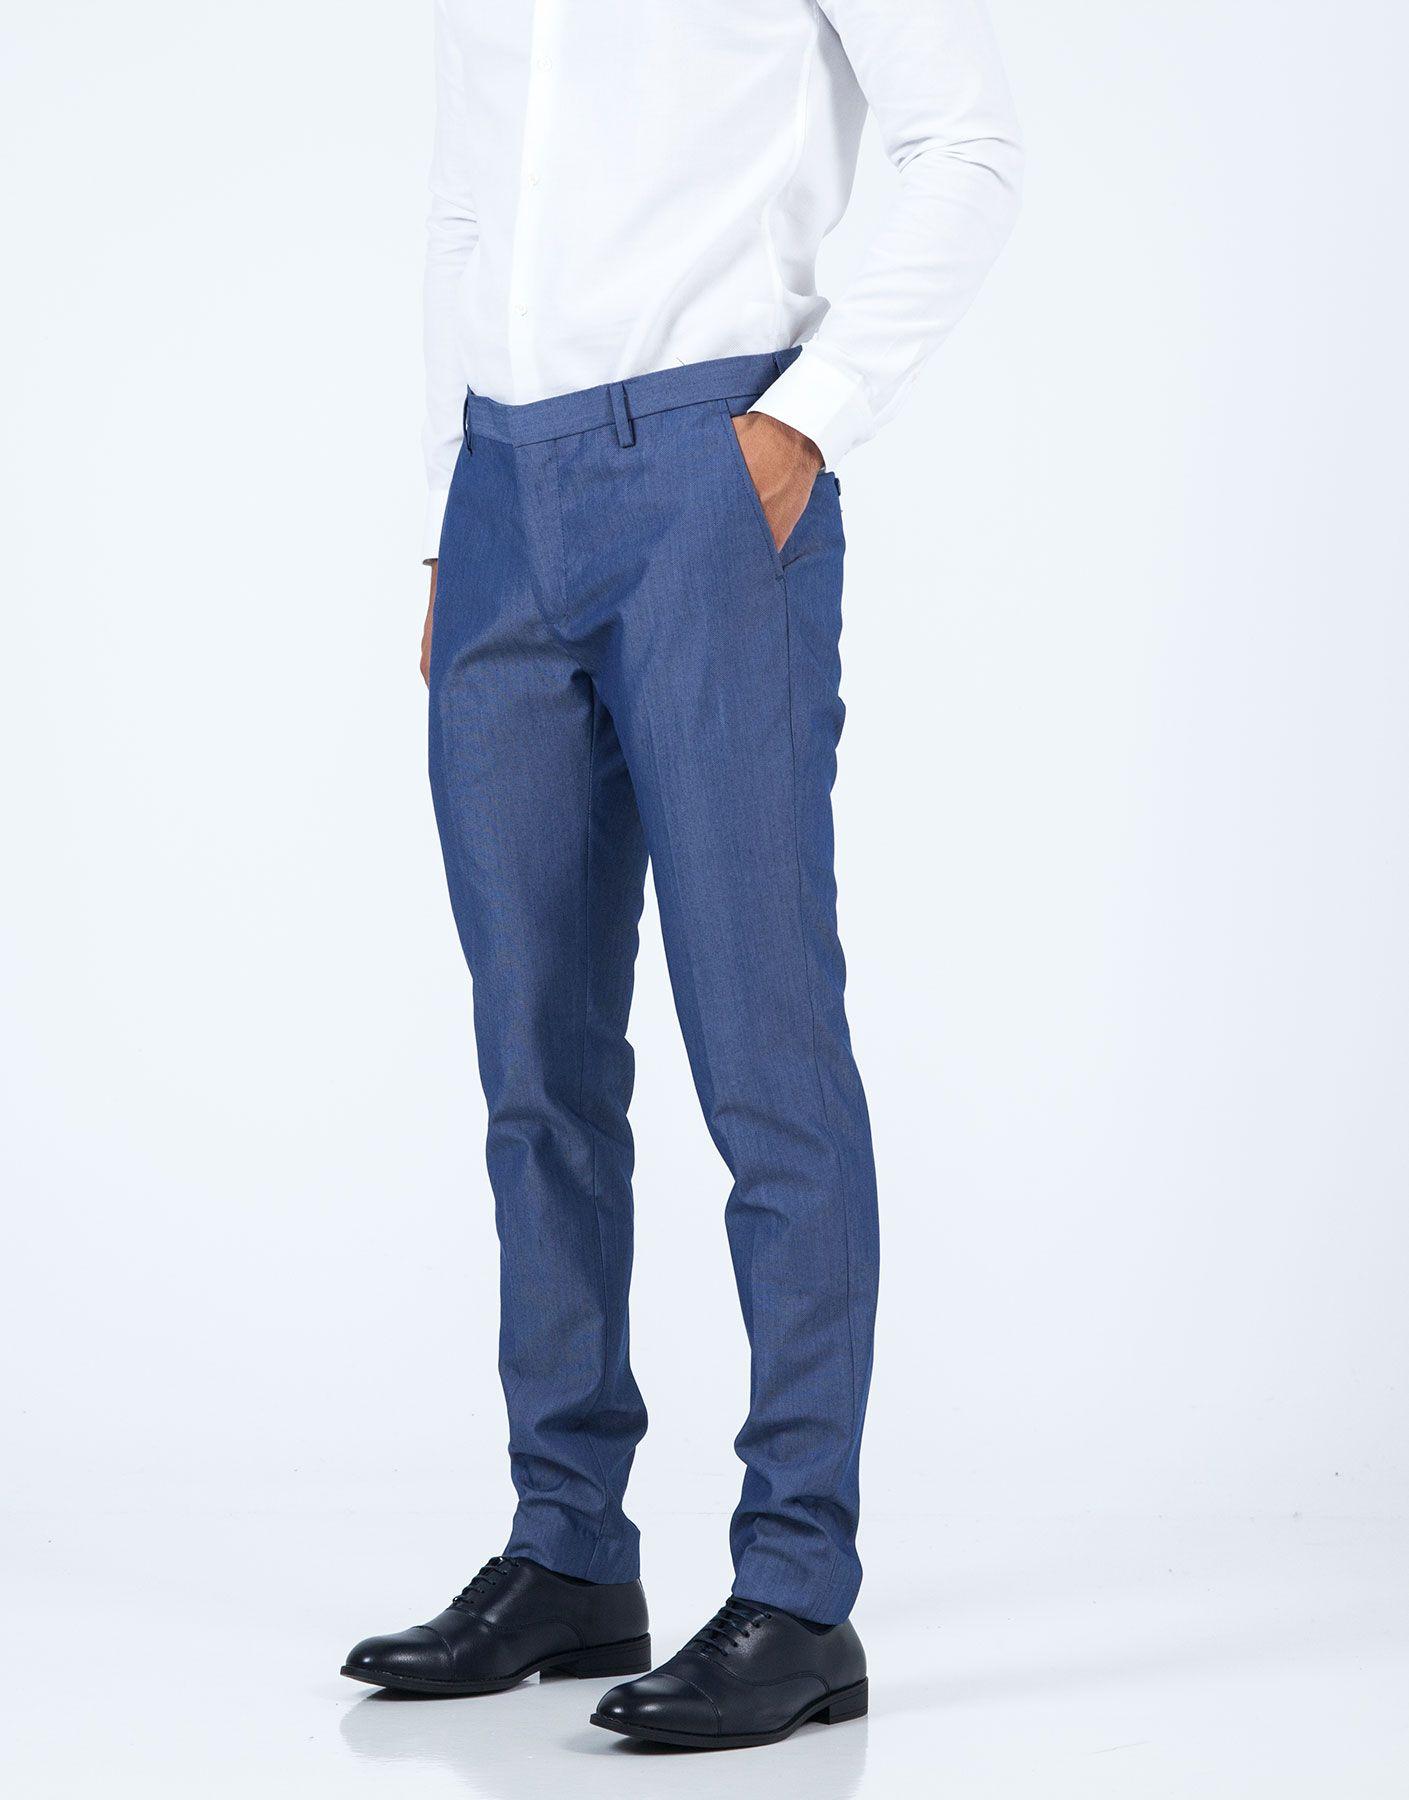 Pantalón traje estructura azul JVZ. | Trajes JVZ FW19 en